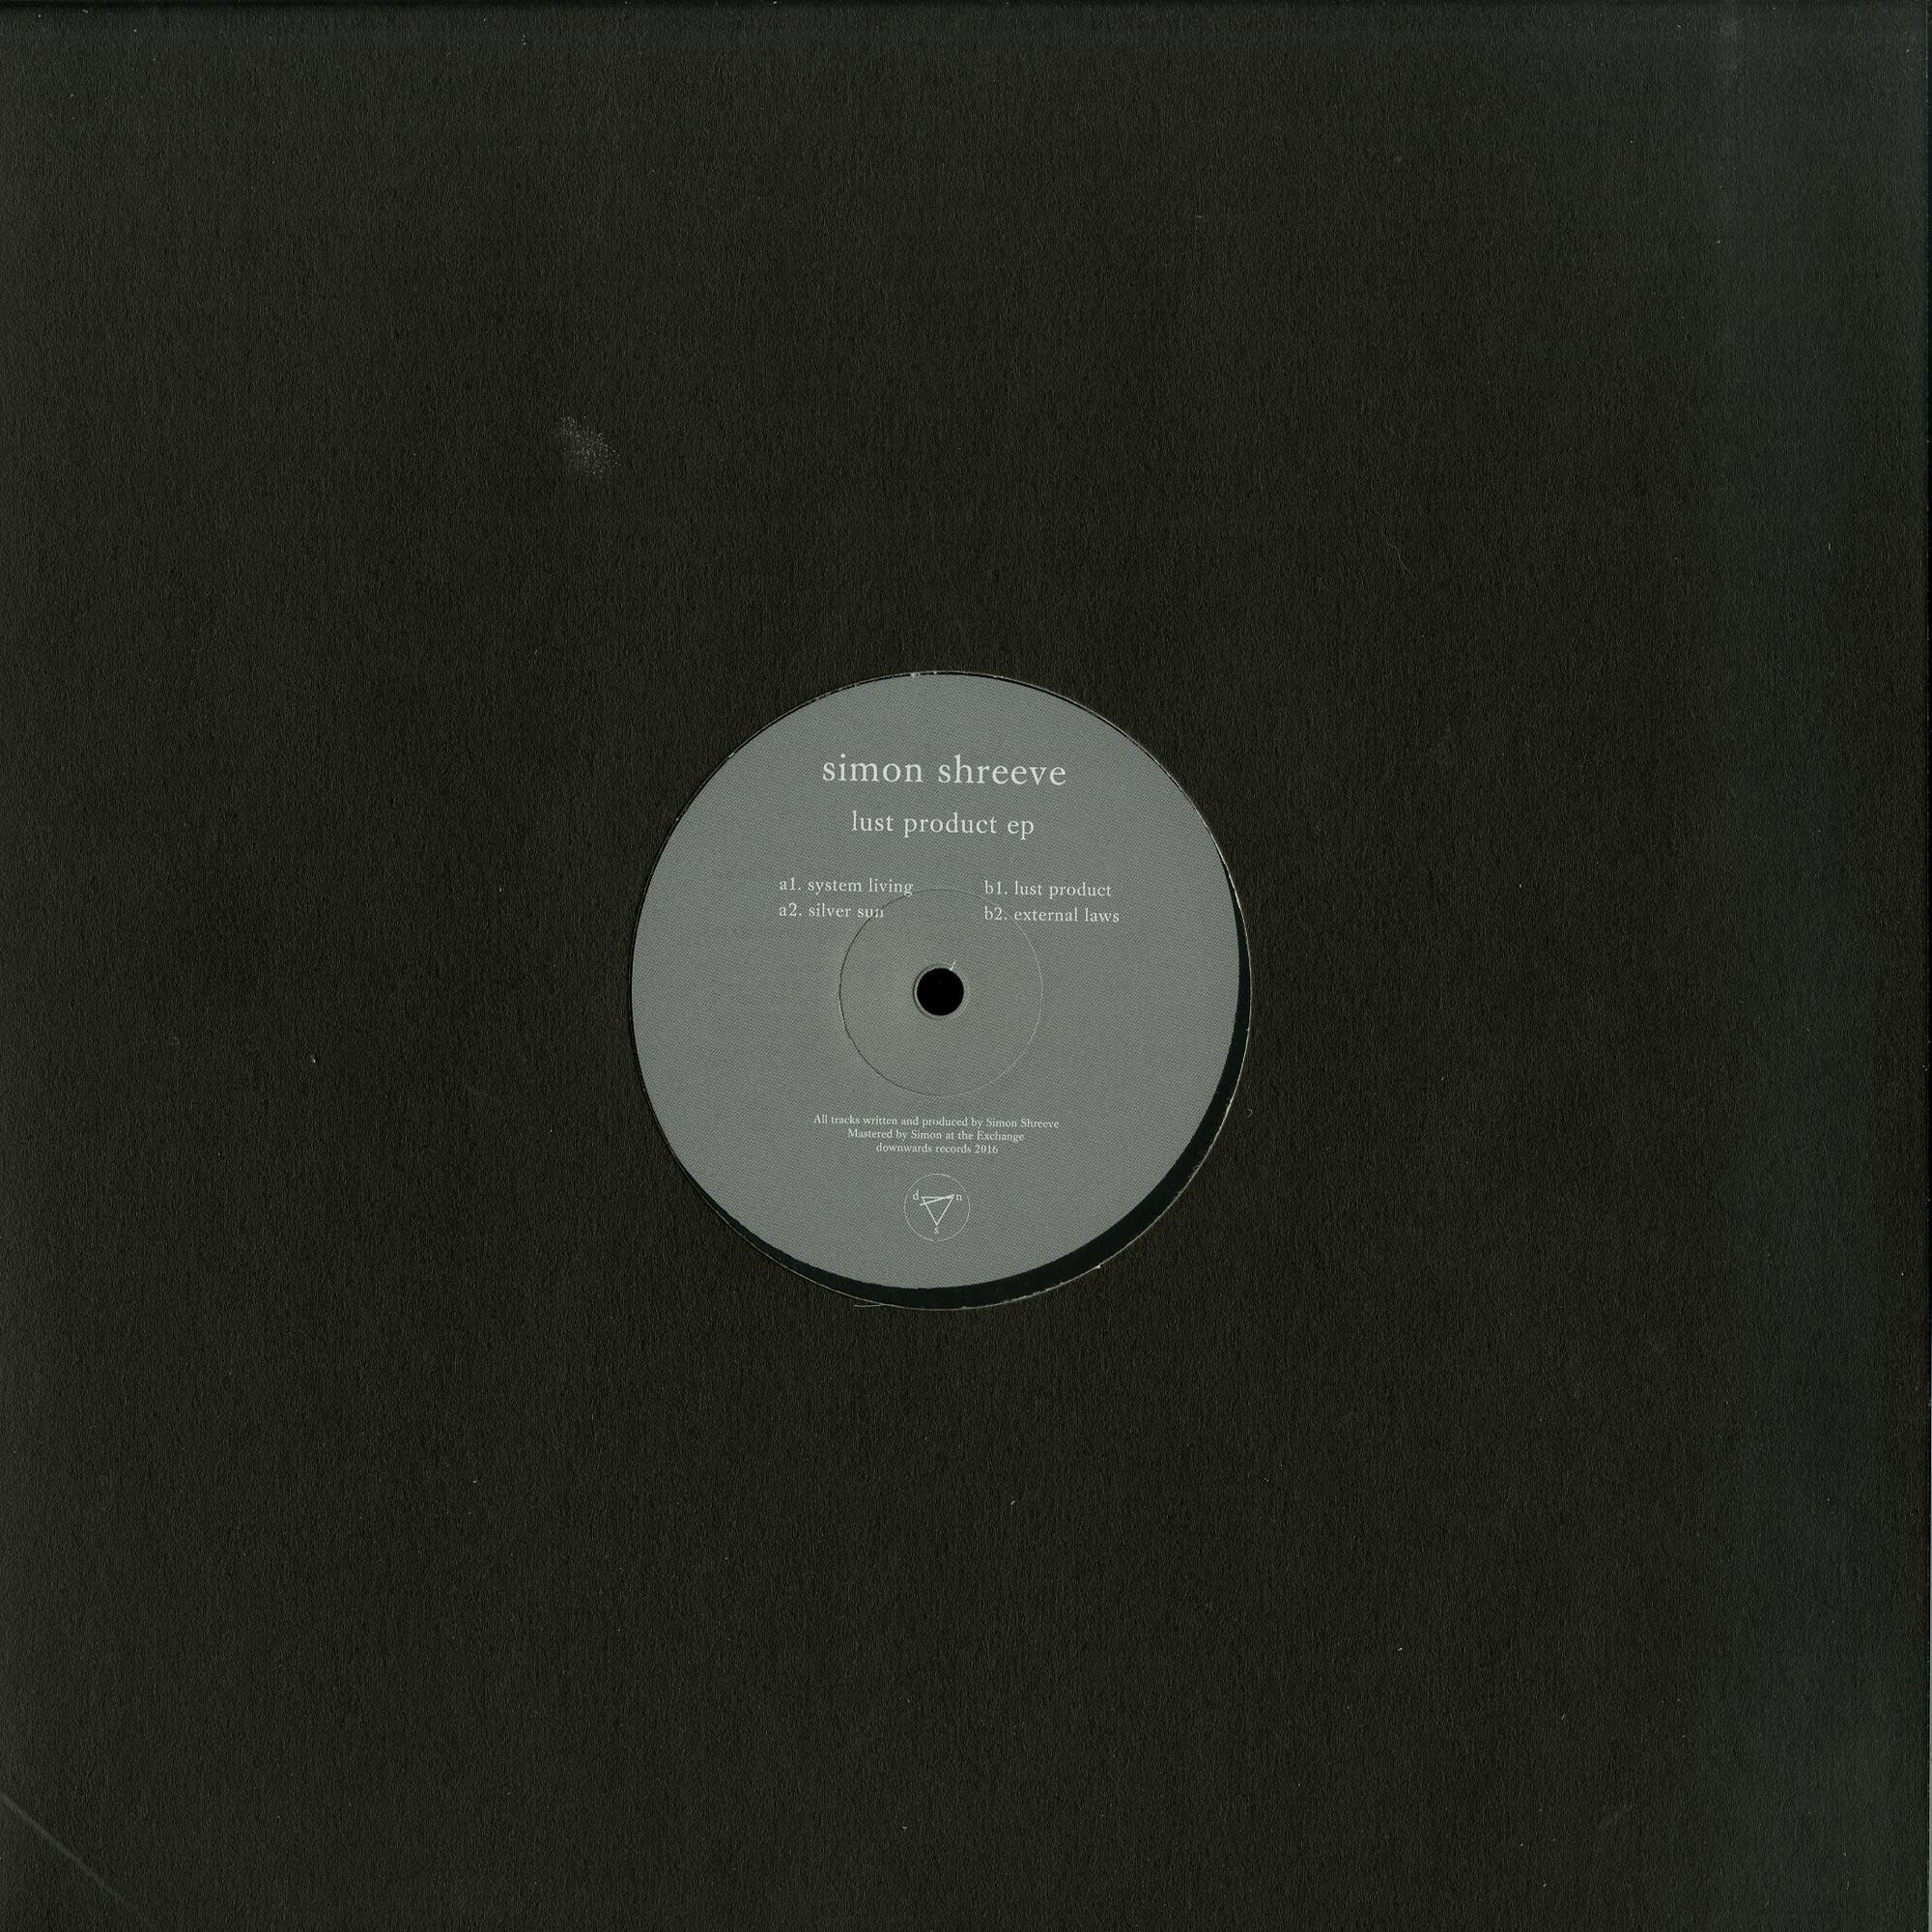 Simon Shreeve - LUST PRODUCT EP